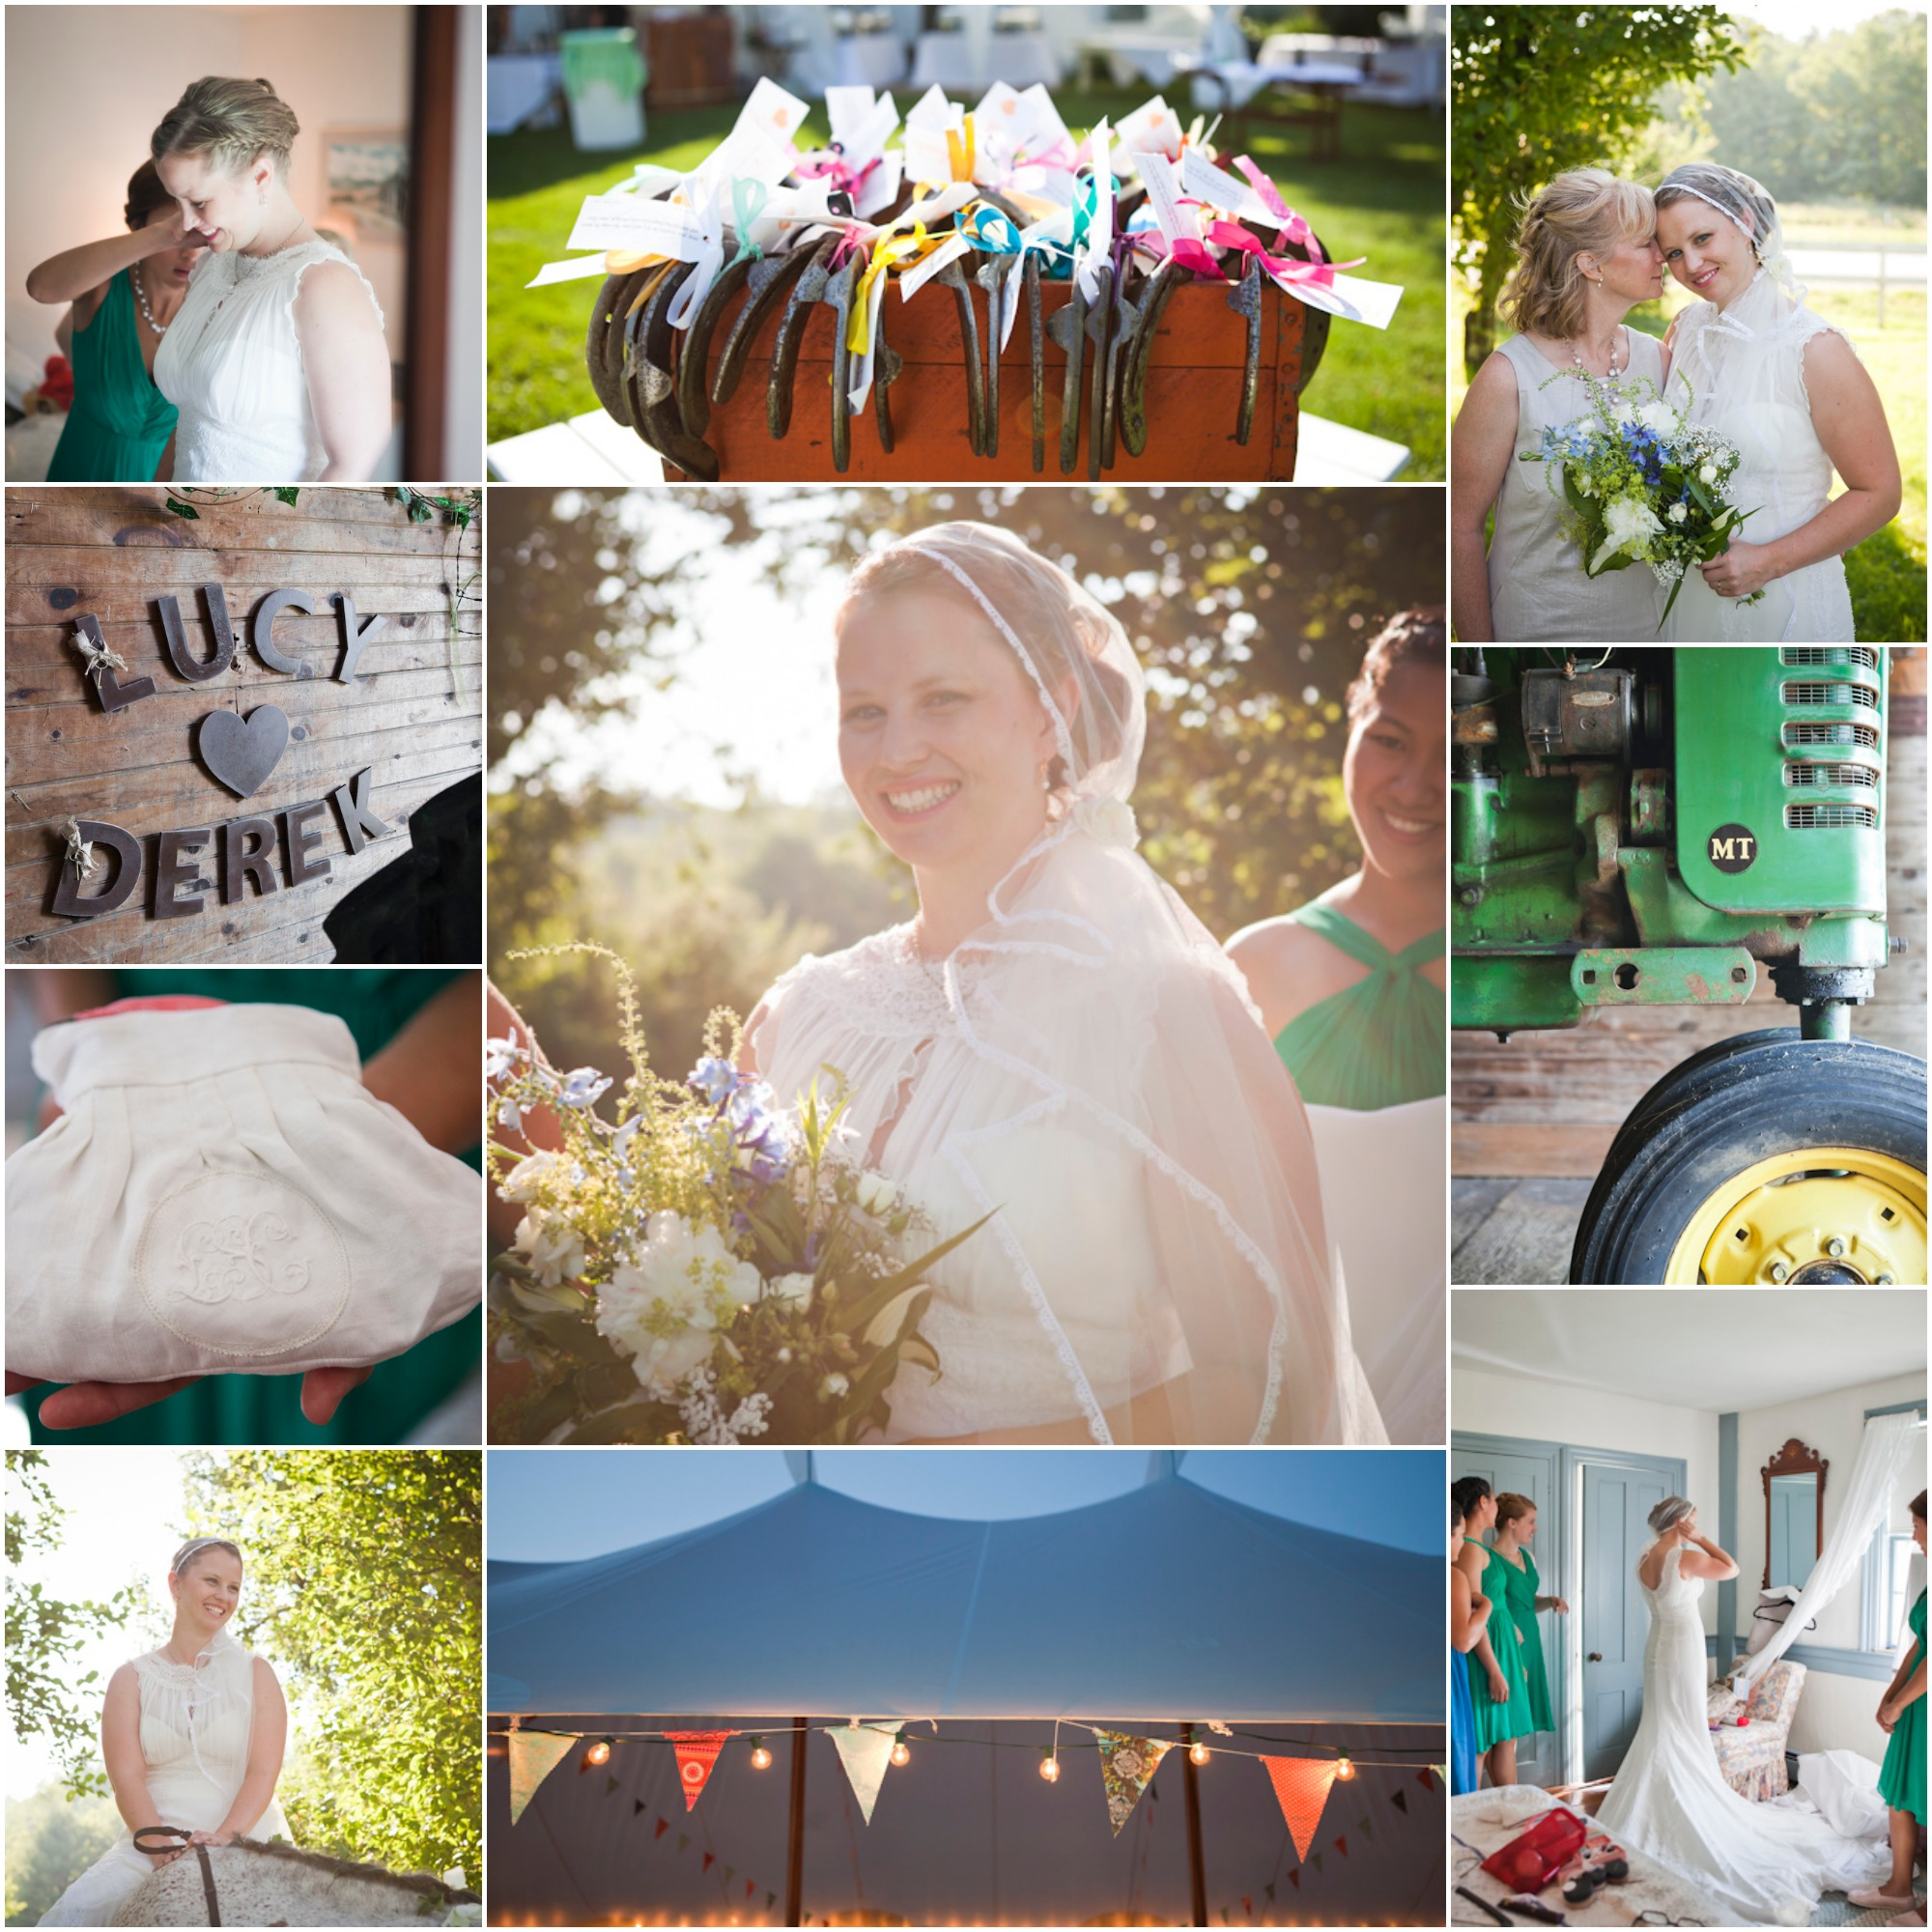 Maine Farm Wedding Lucy Derek Rustic Wedding Chic